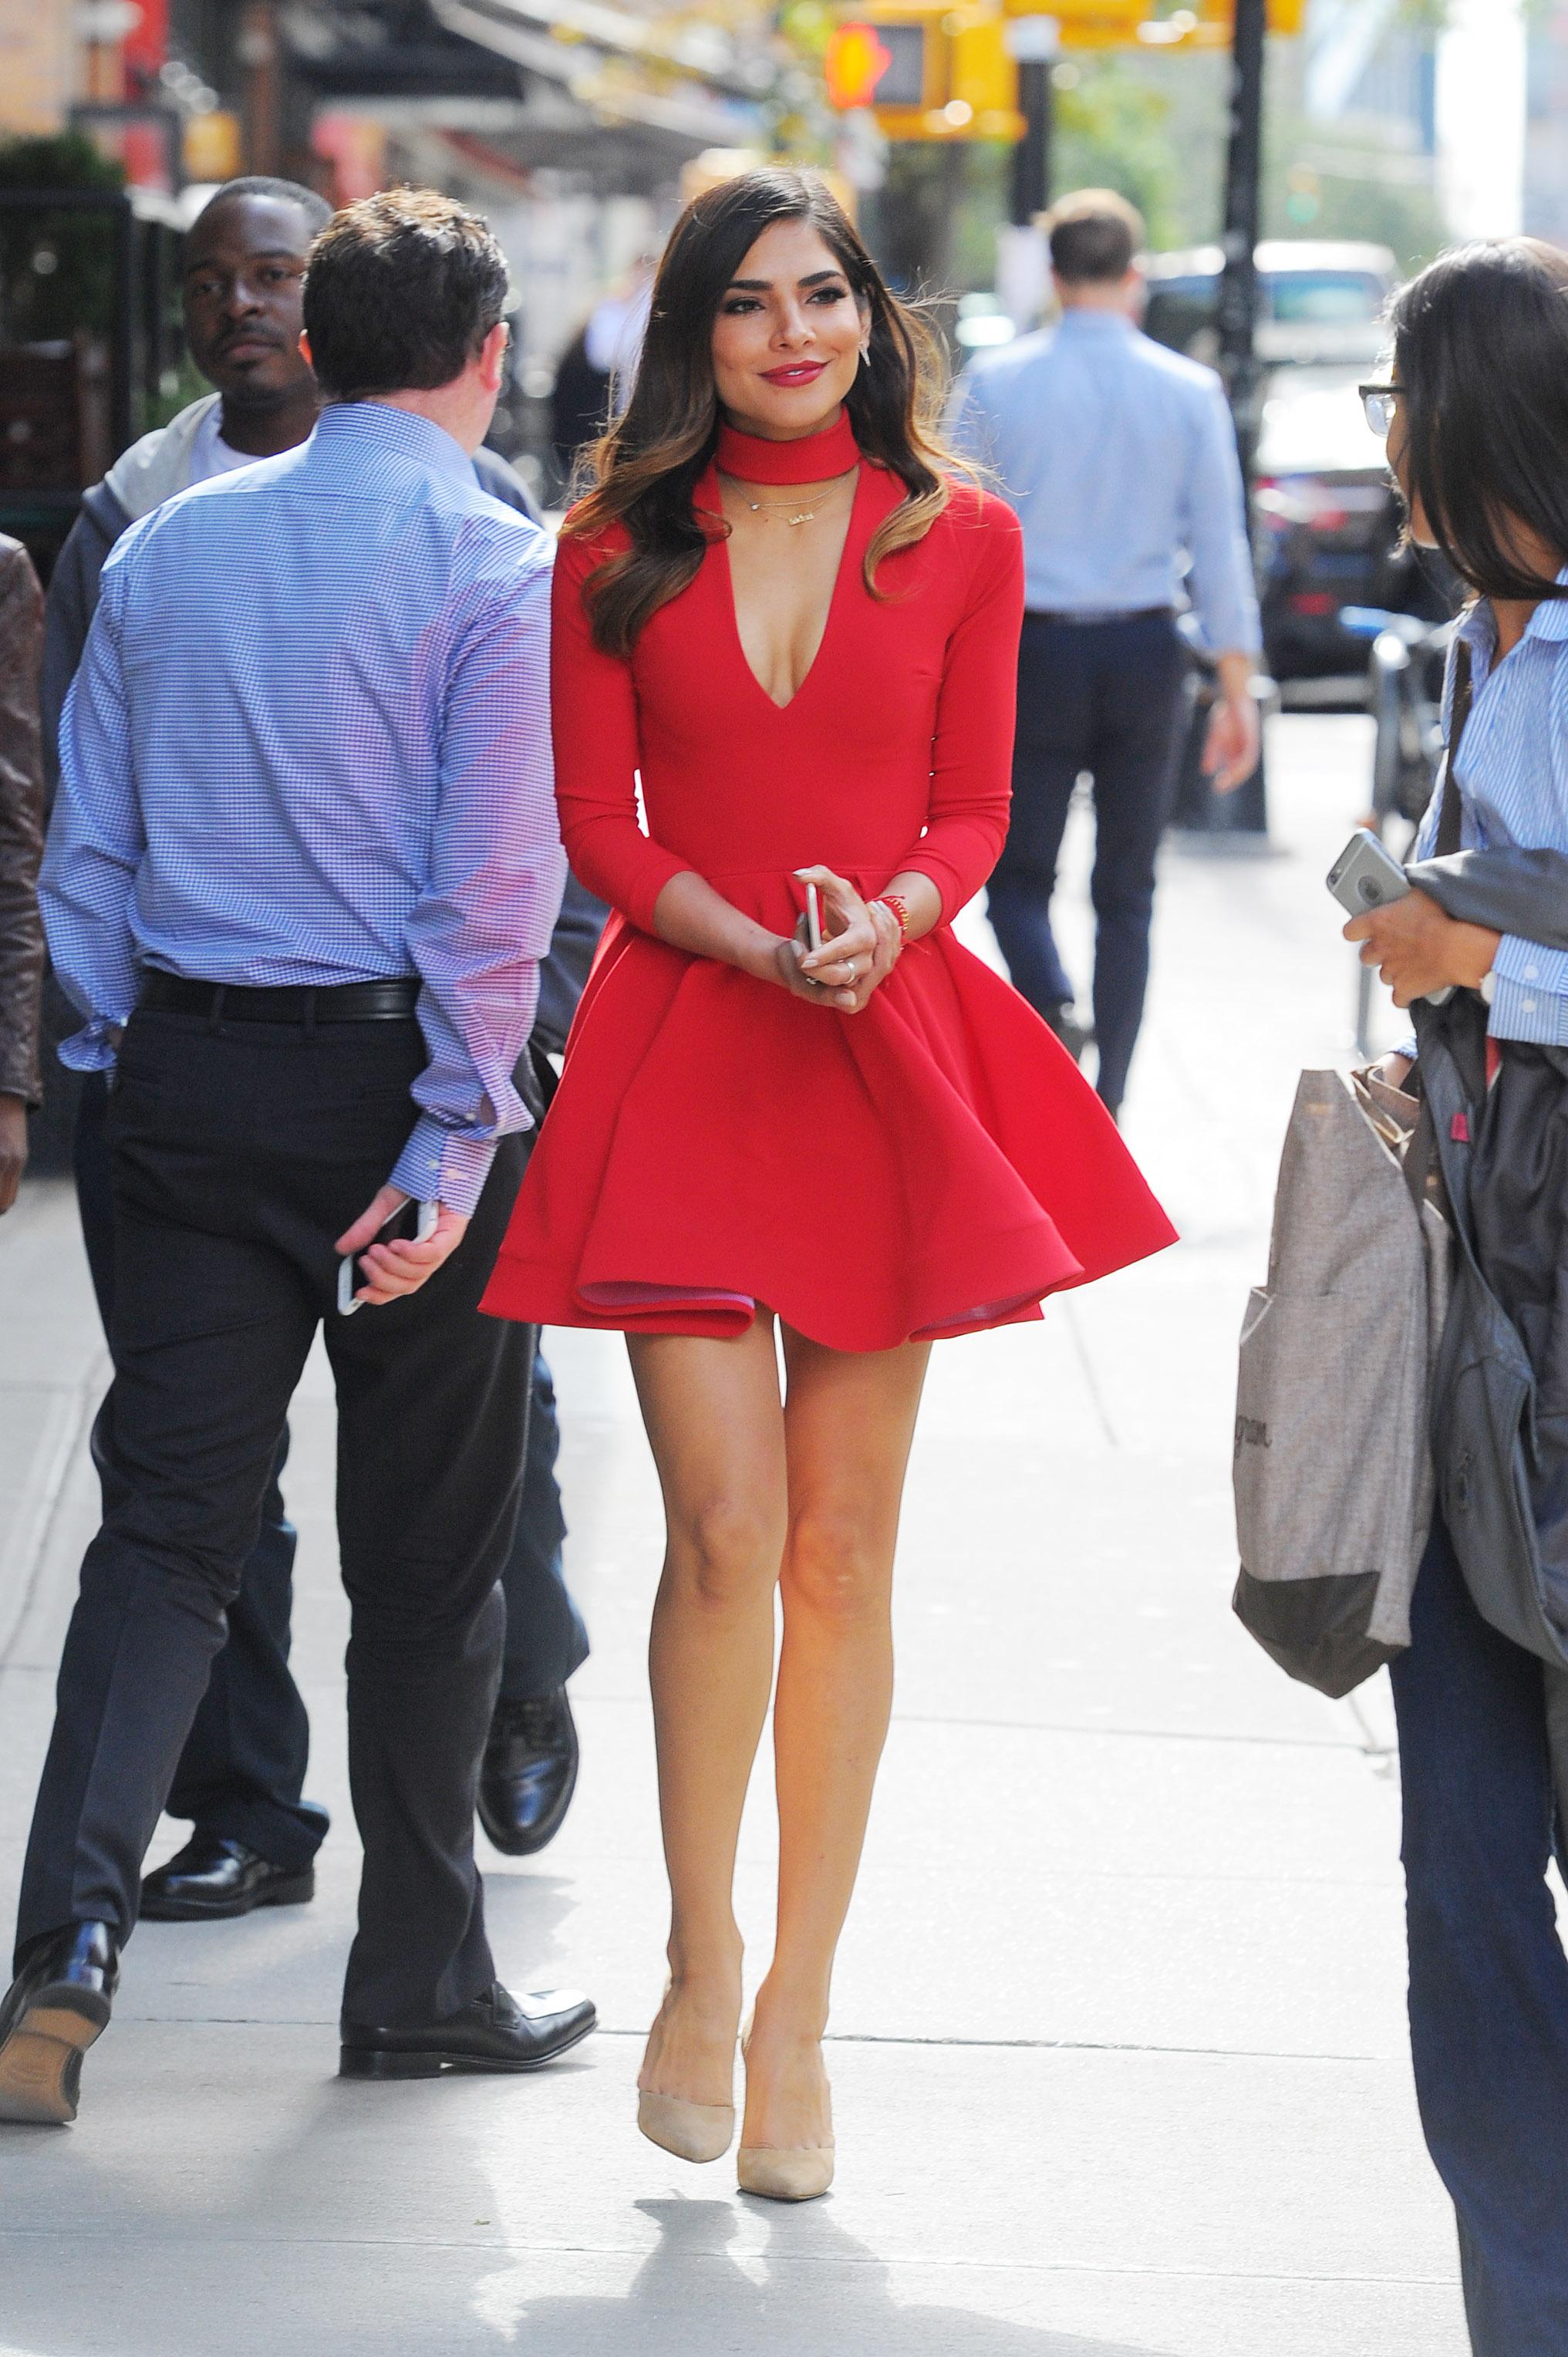 Olivia Culpo in Red Mini Dress -09 - GotCeleb Miley Cyrus